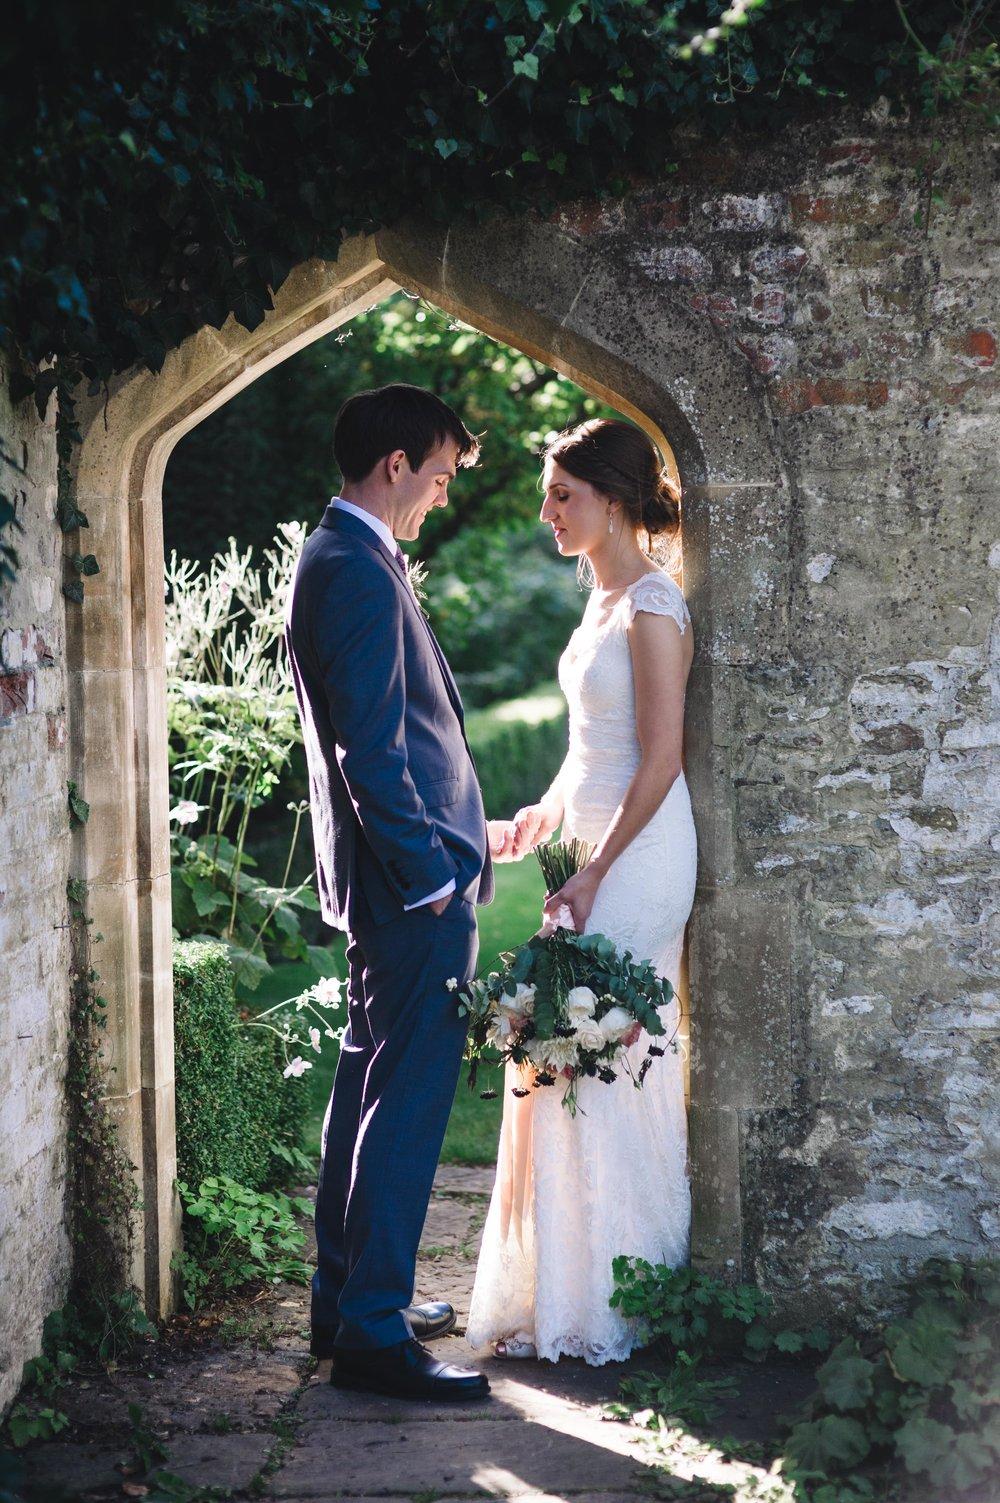 WIltshire weddings - Rachel and Chris (169 of 175).jpg